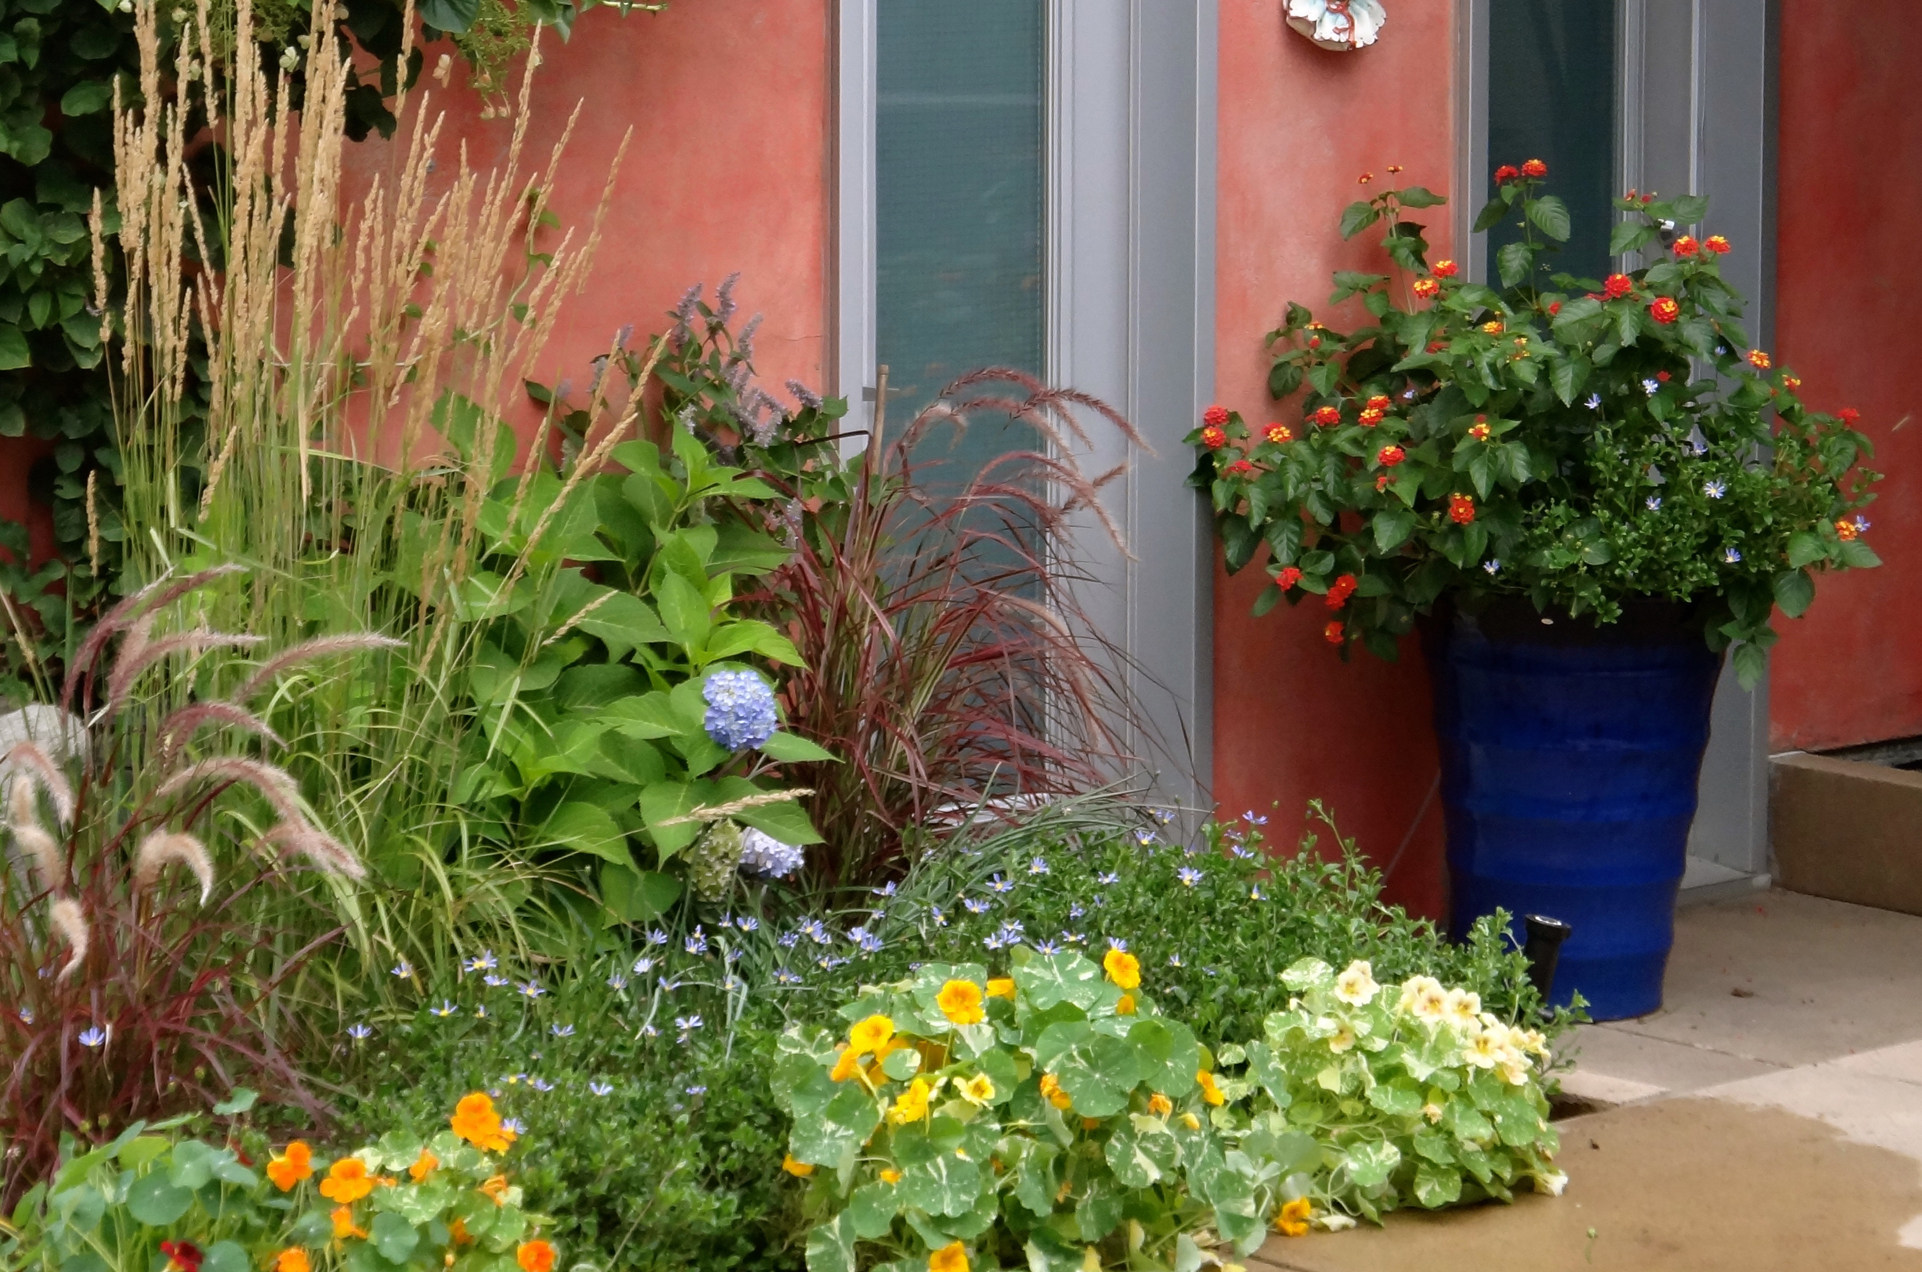 Cabanes de jardin - Les Jardins Animés inc.